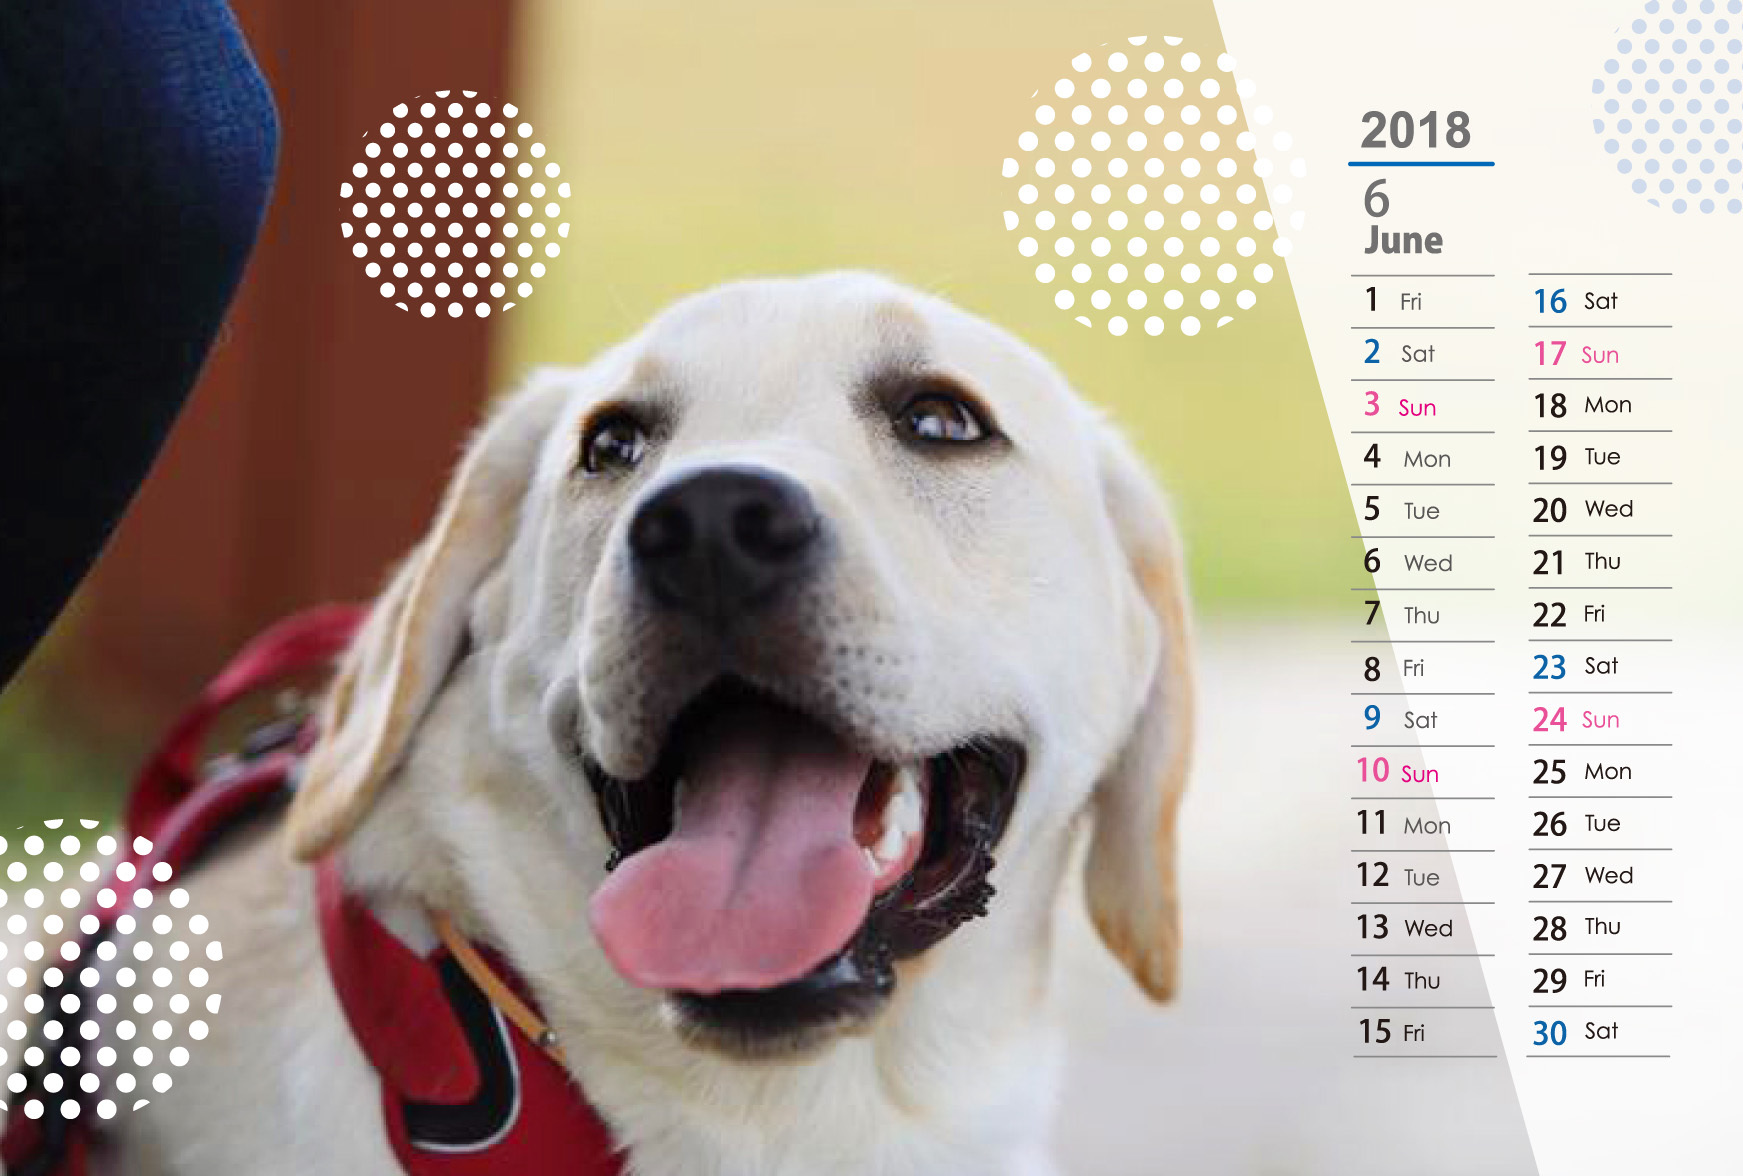 TIKILOVEカレンダー 2018_f0051481_10445803.jpg